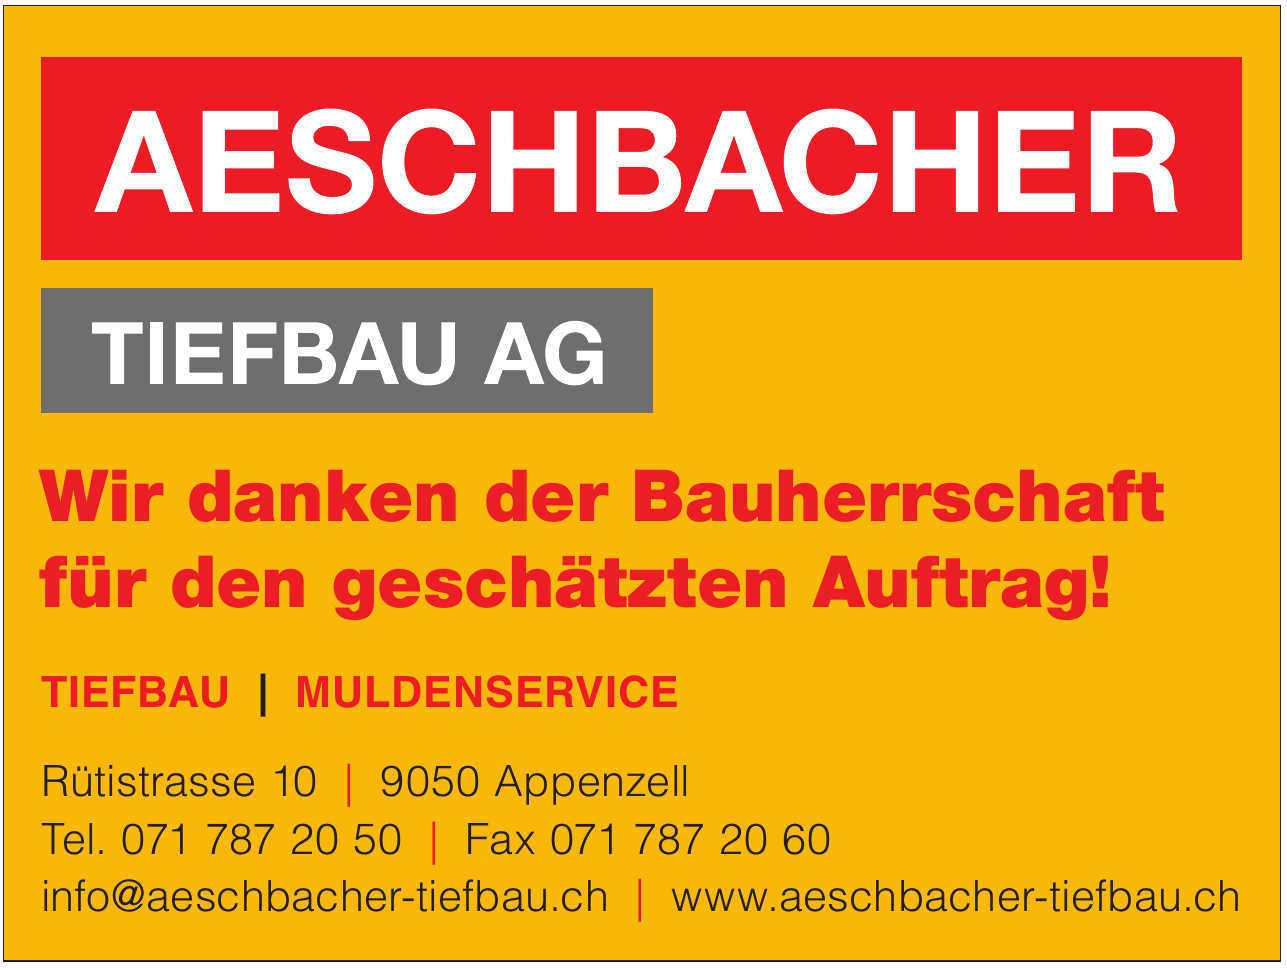 Aeschbacher Tiefbau AG